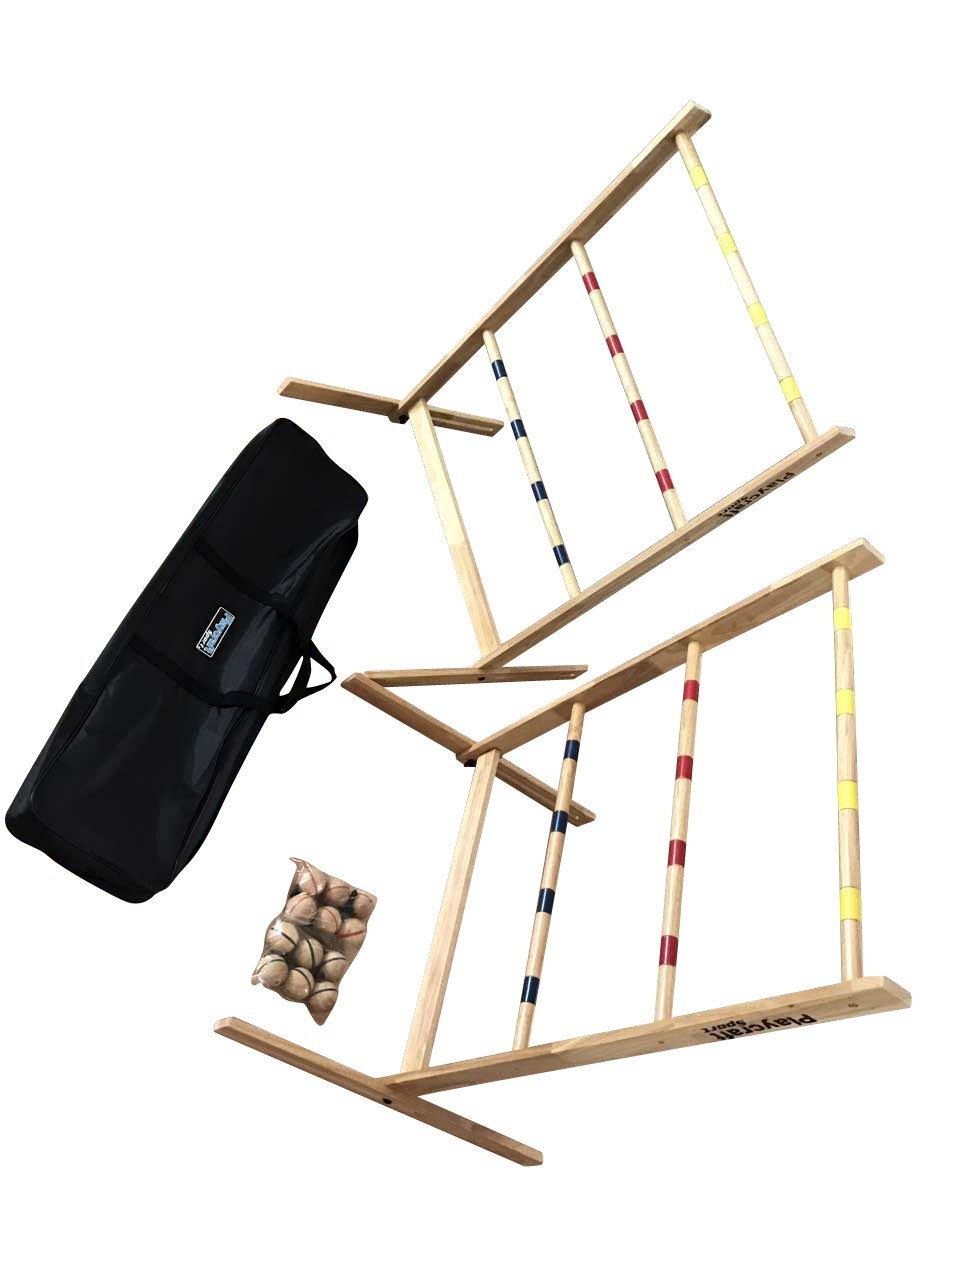 Playcraft Sport Deluxe Hardwood Ladder Toss by Playcraft Sport